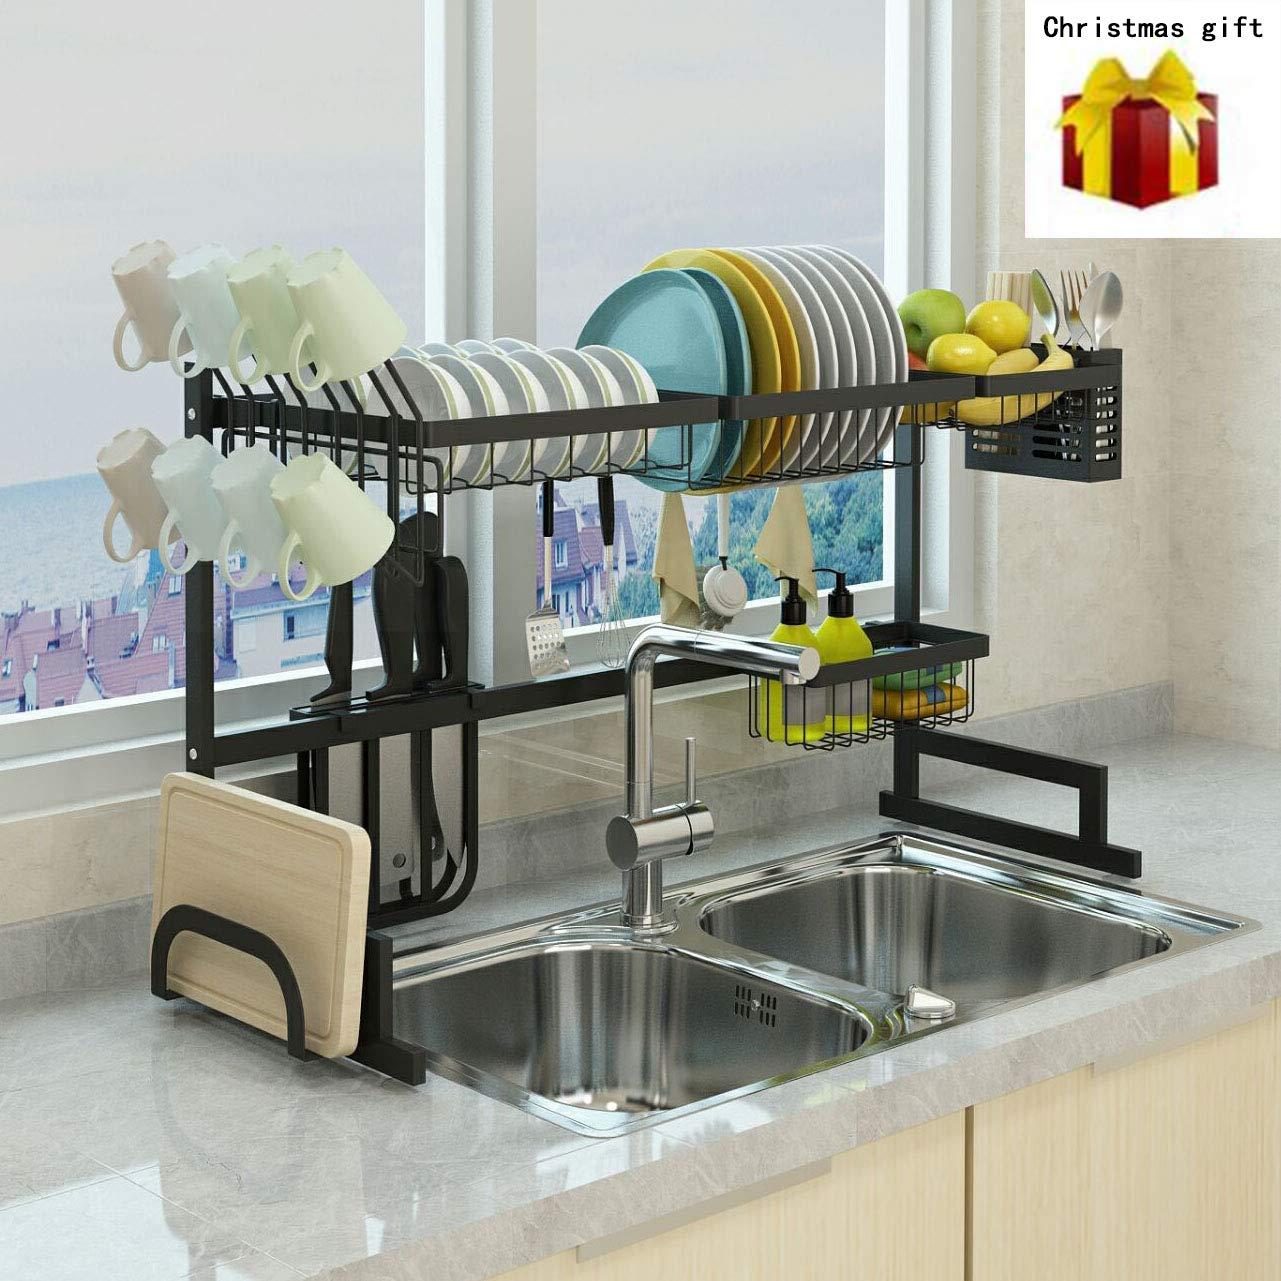 Fully Customizable Multipurpose Large Capacity PremiumRacks Professional Over The Sink Dish Rack